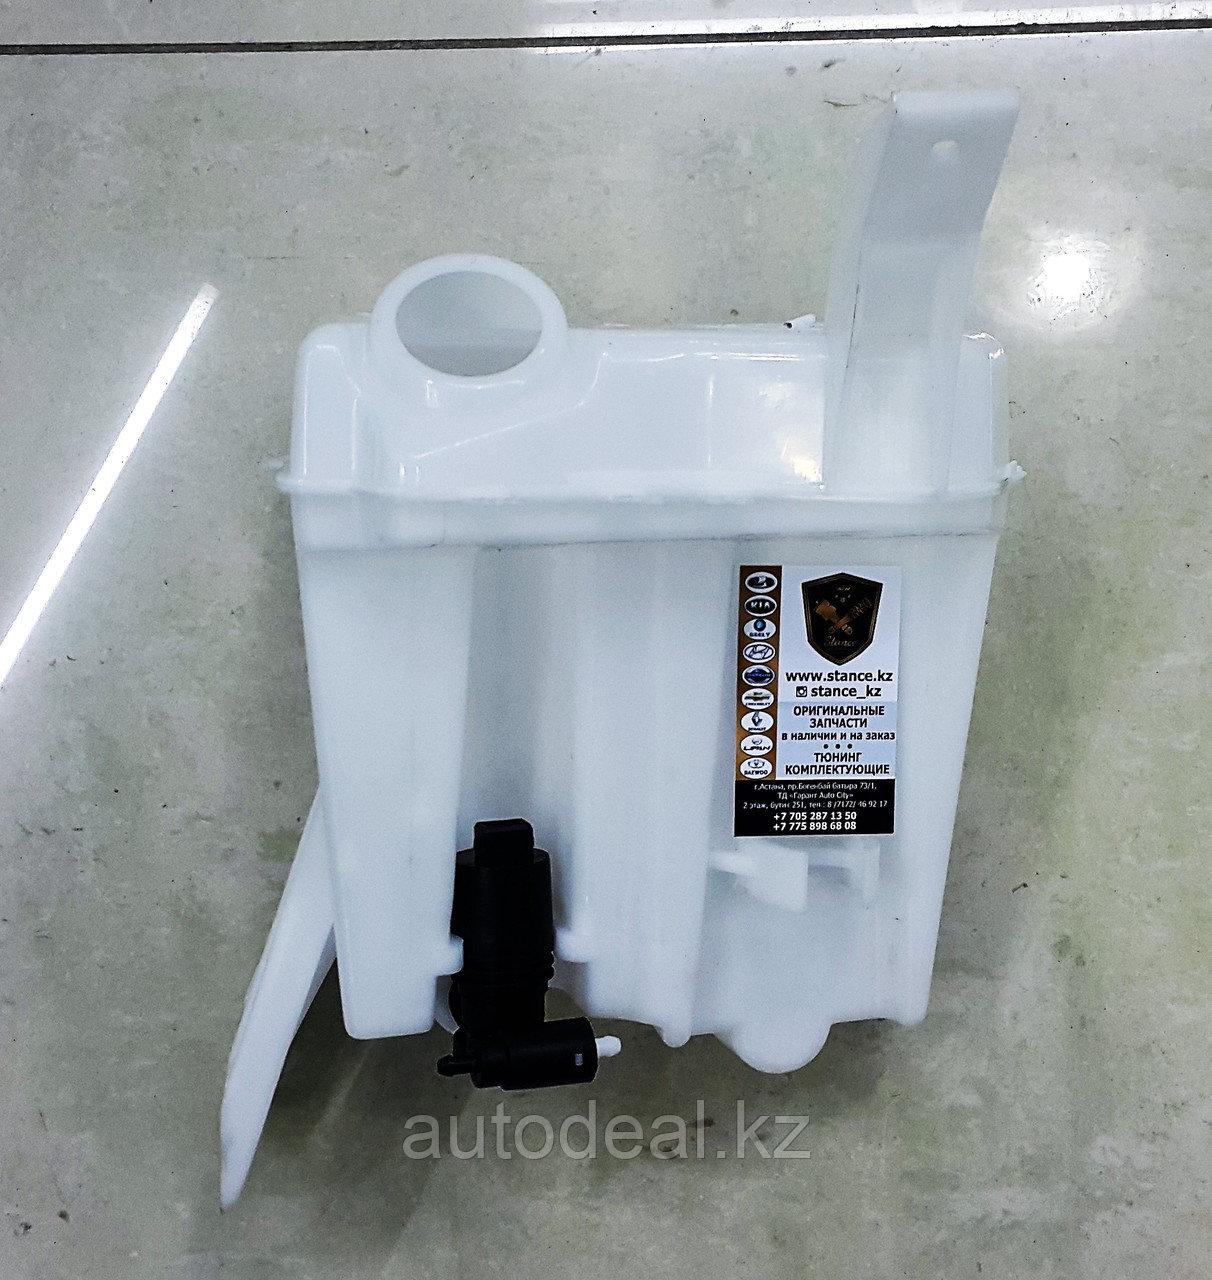 Бачок стеклоомывателя Lifan X60 / Windshield washer reservoir